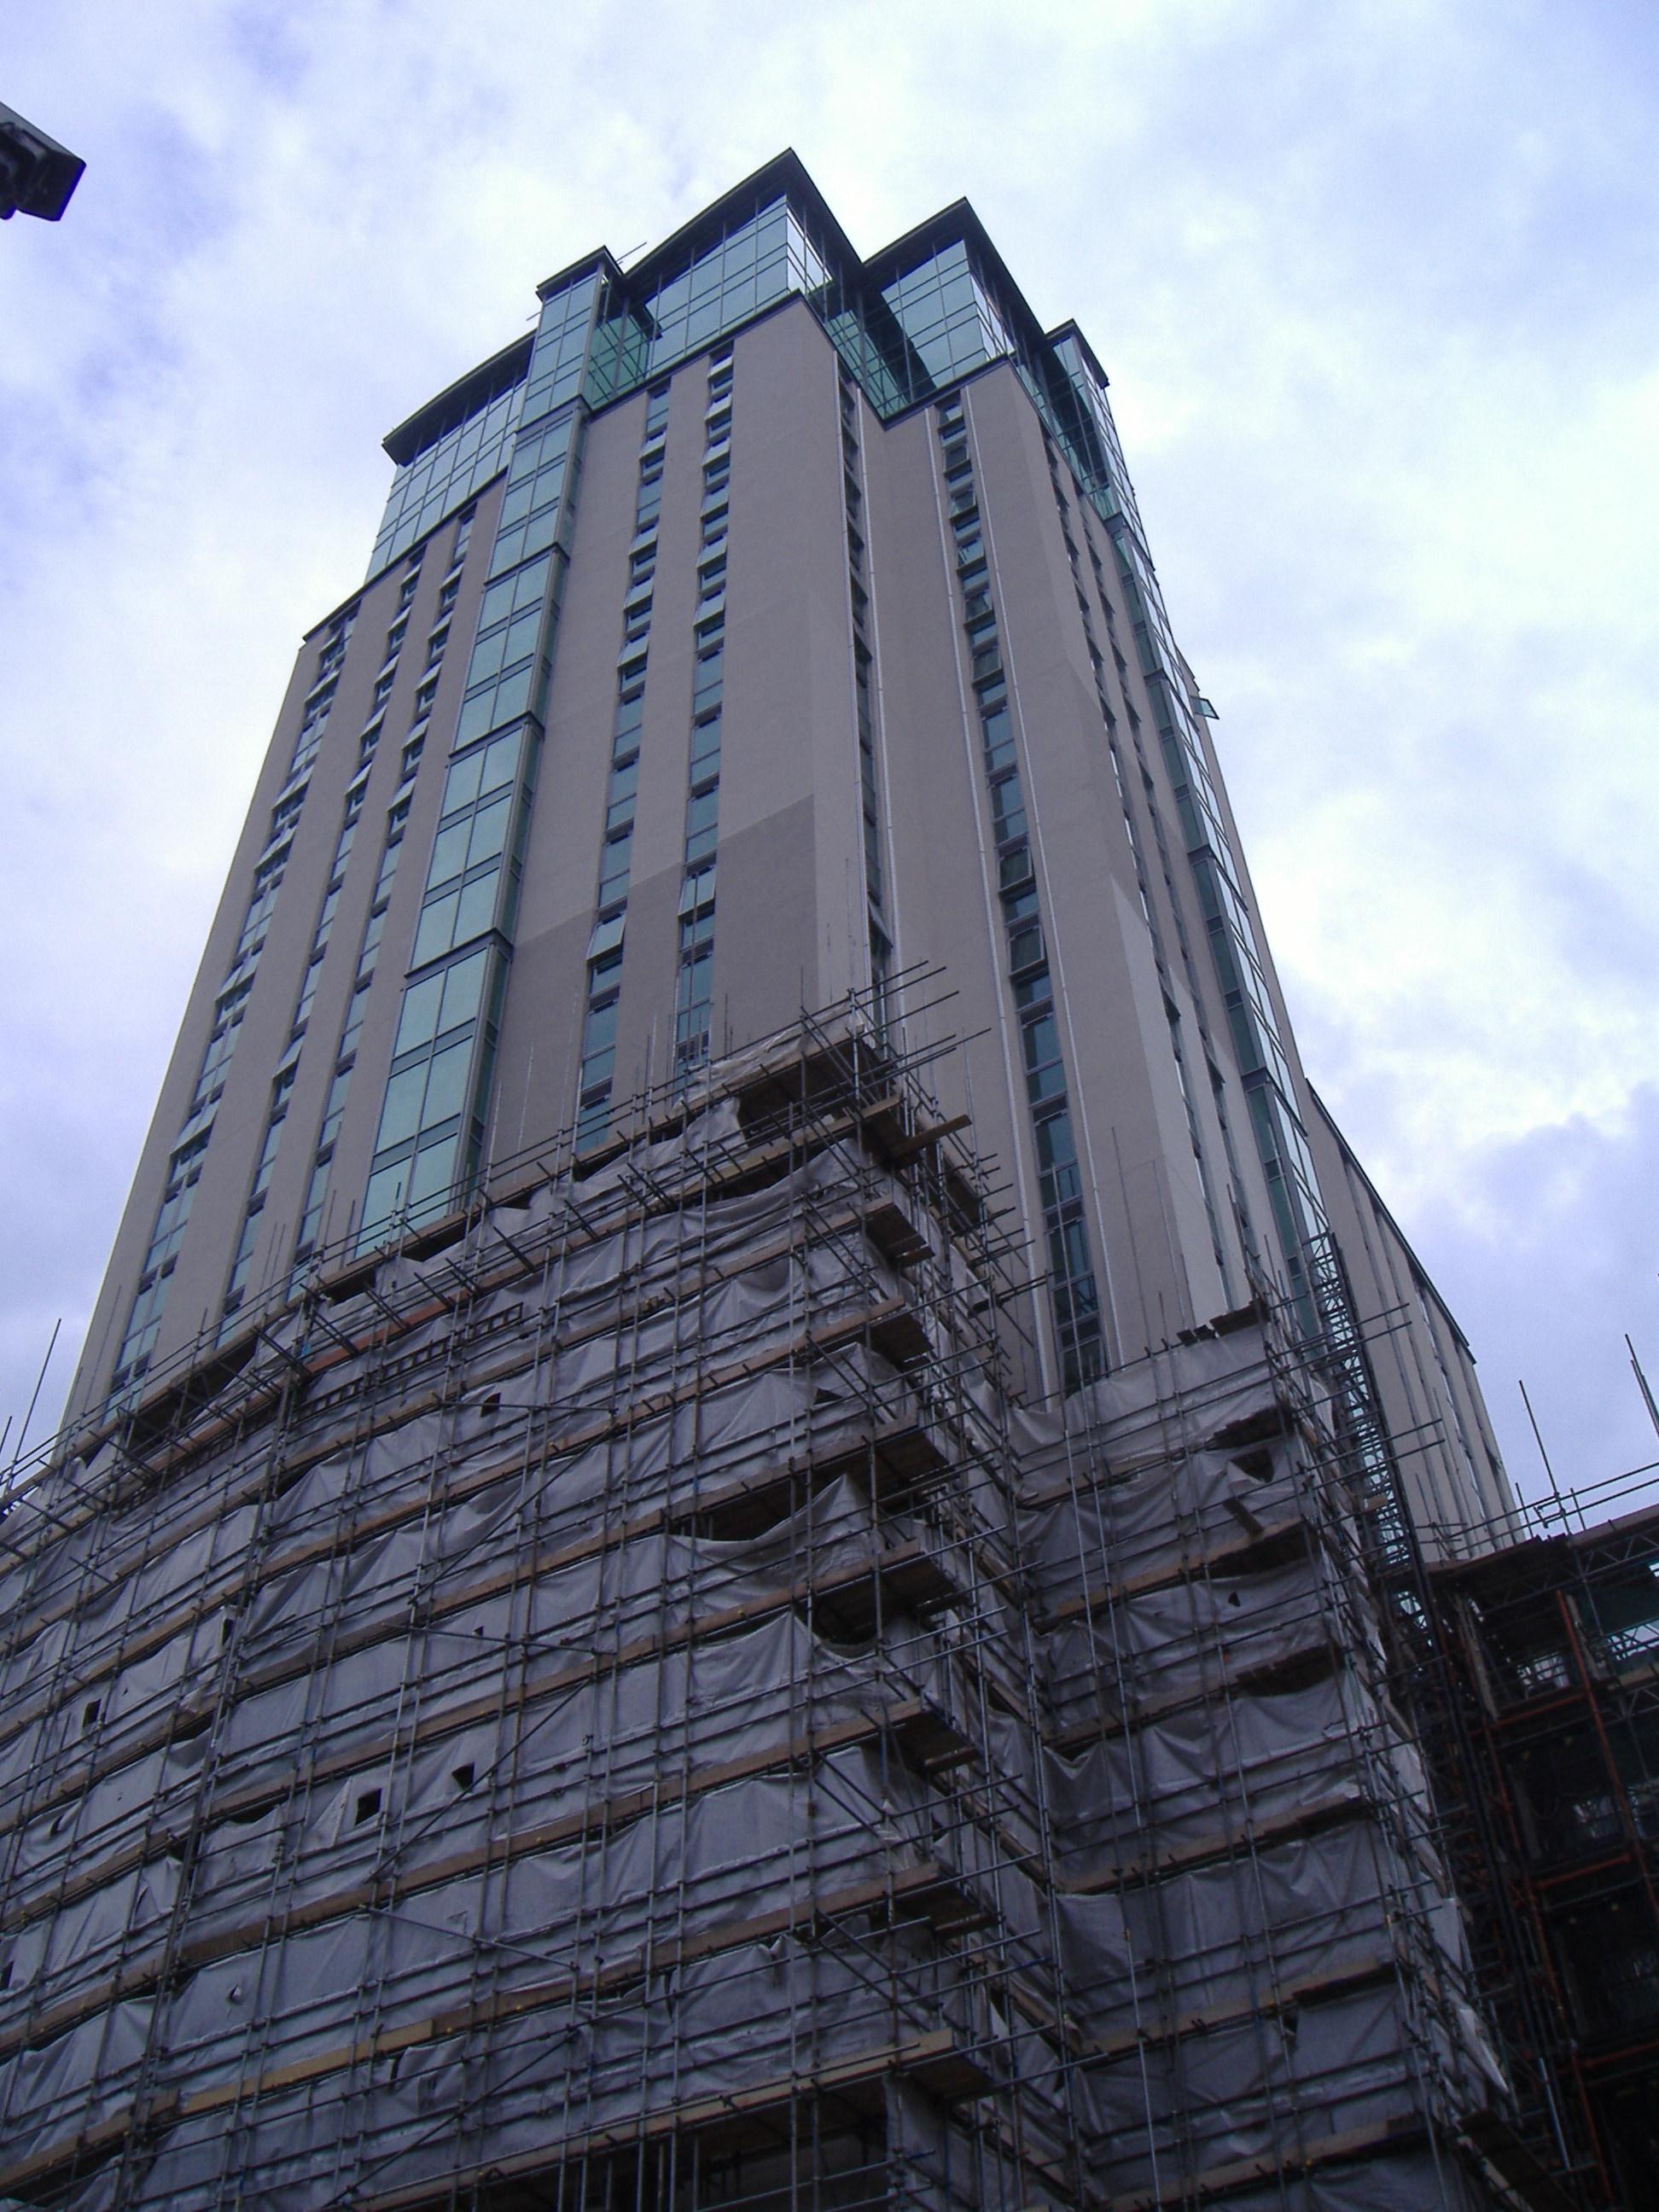 Orion Building - Wikipedia